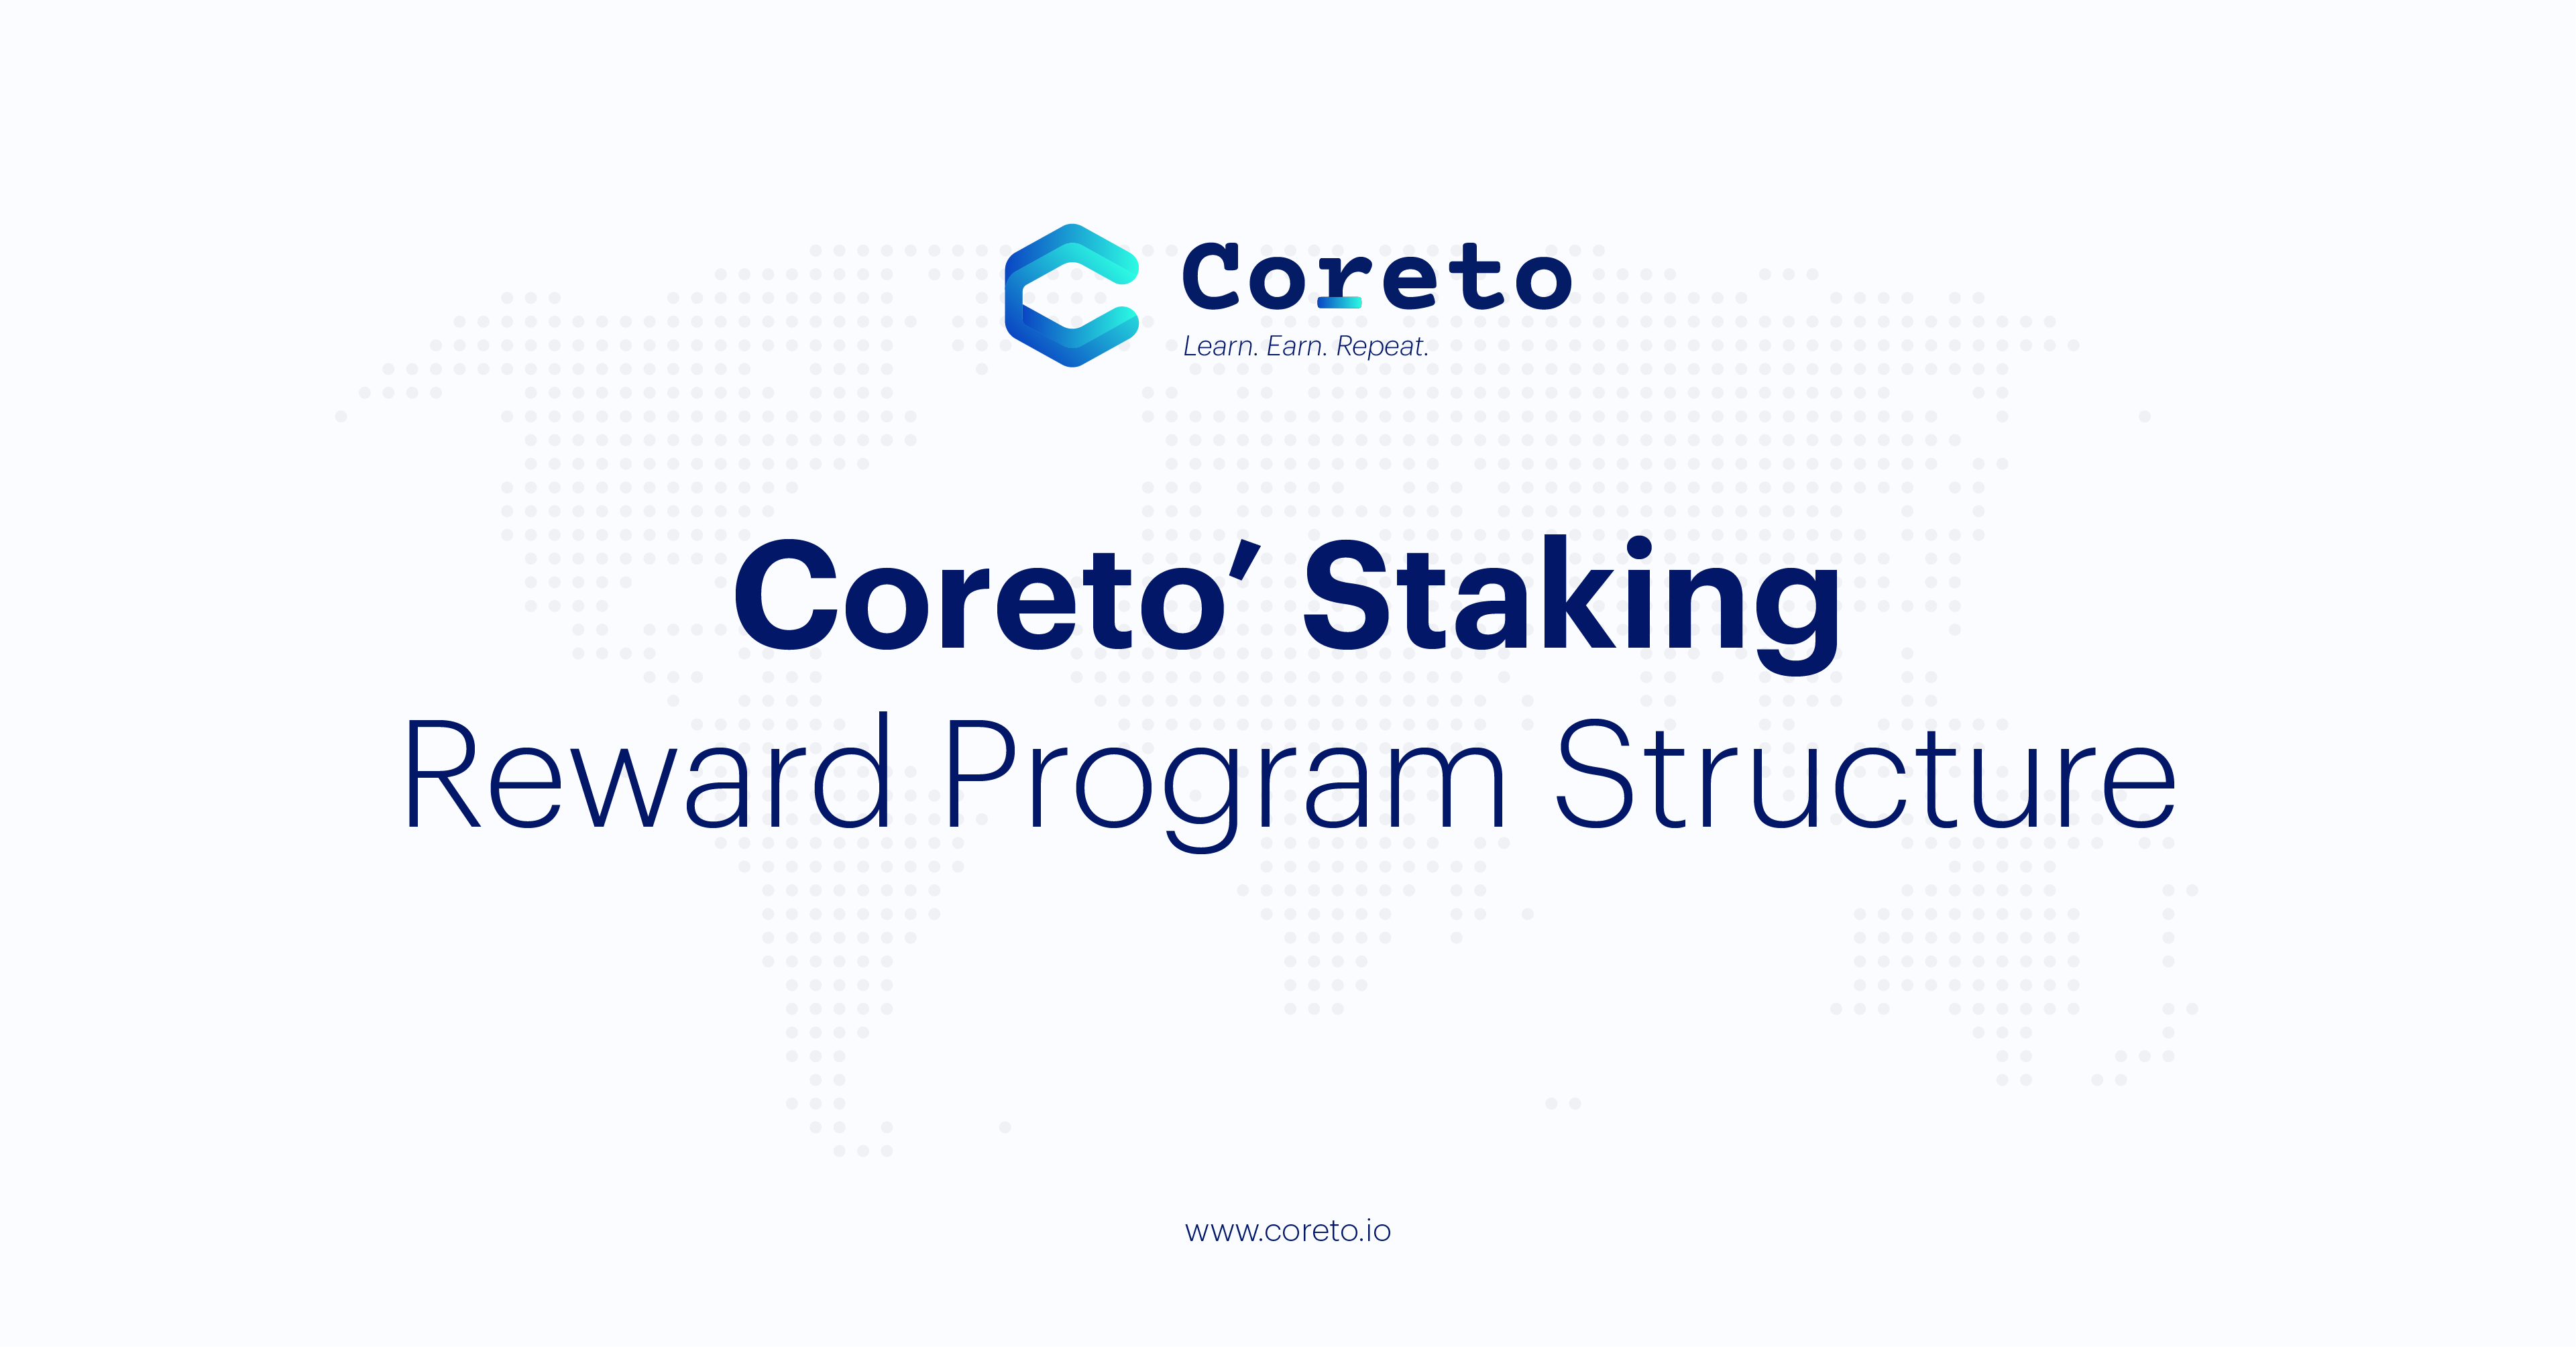 coreto staking reward program